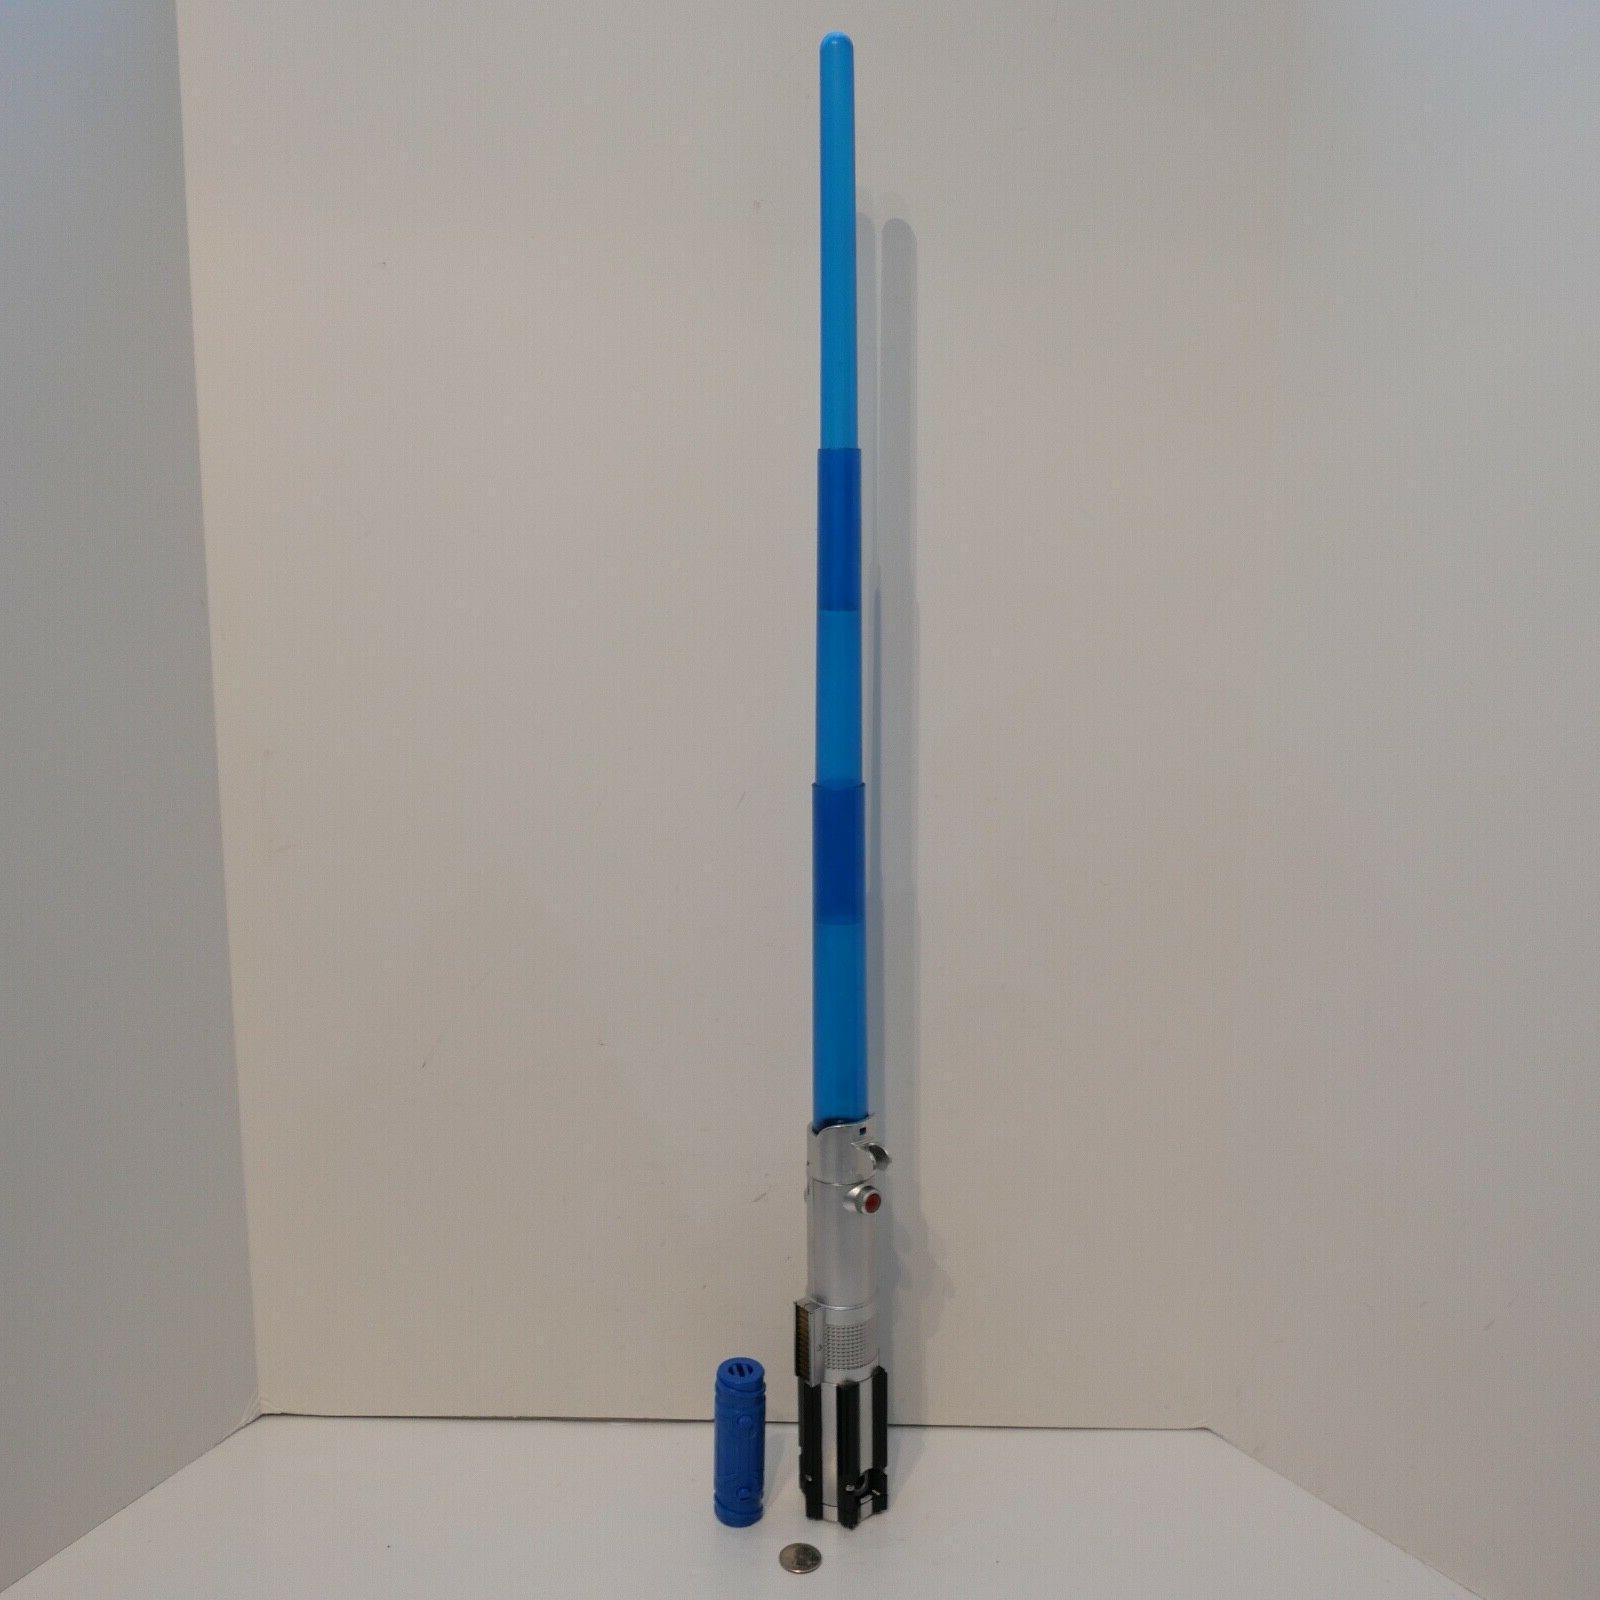 star wars bladebuilders rey starkiller base electronic